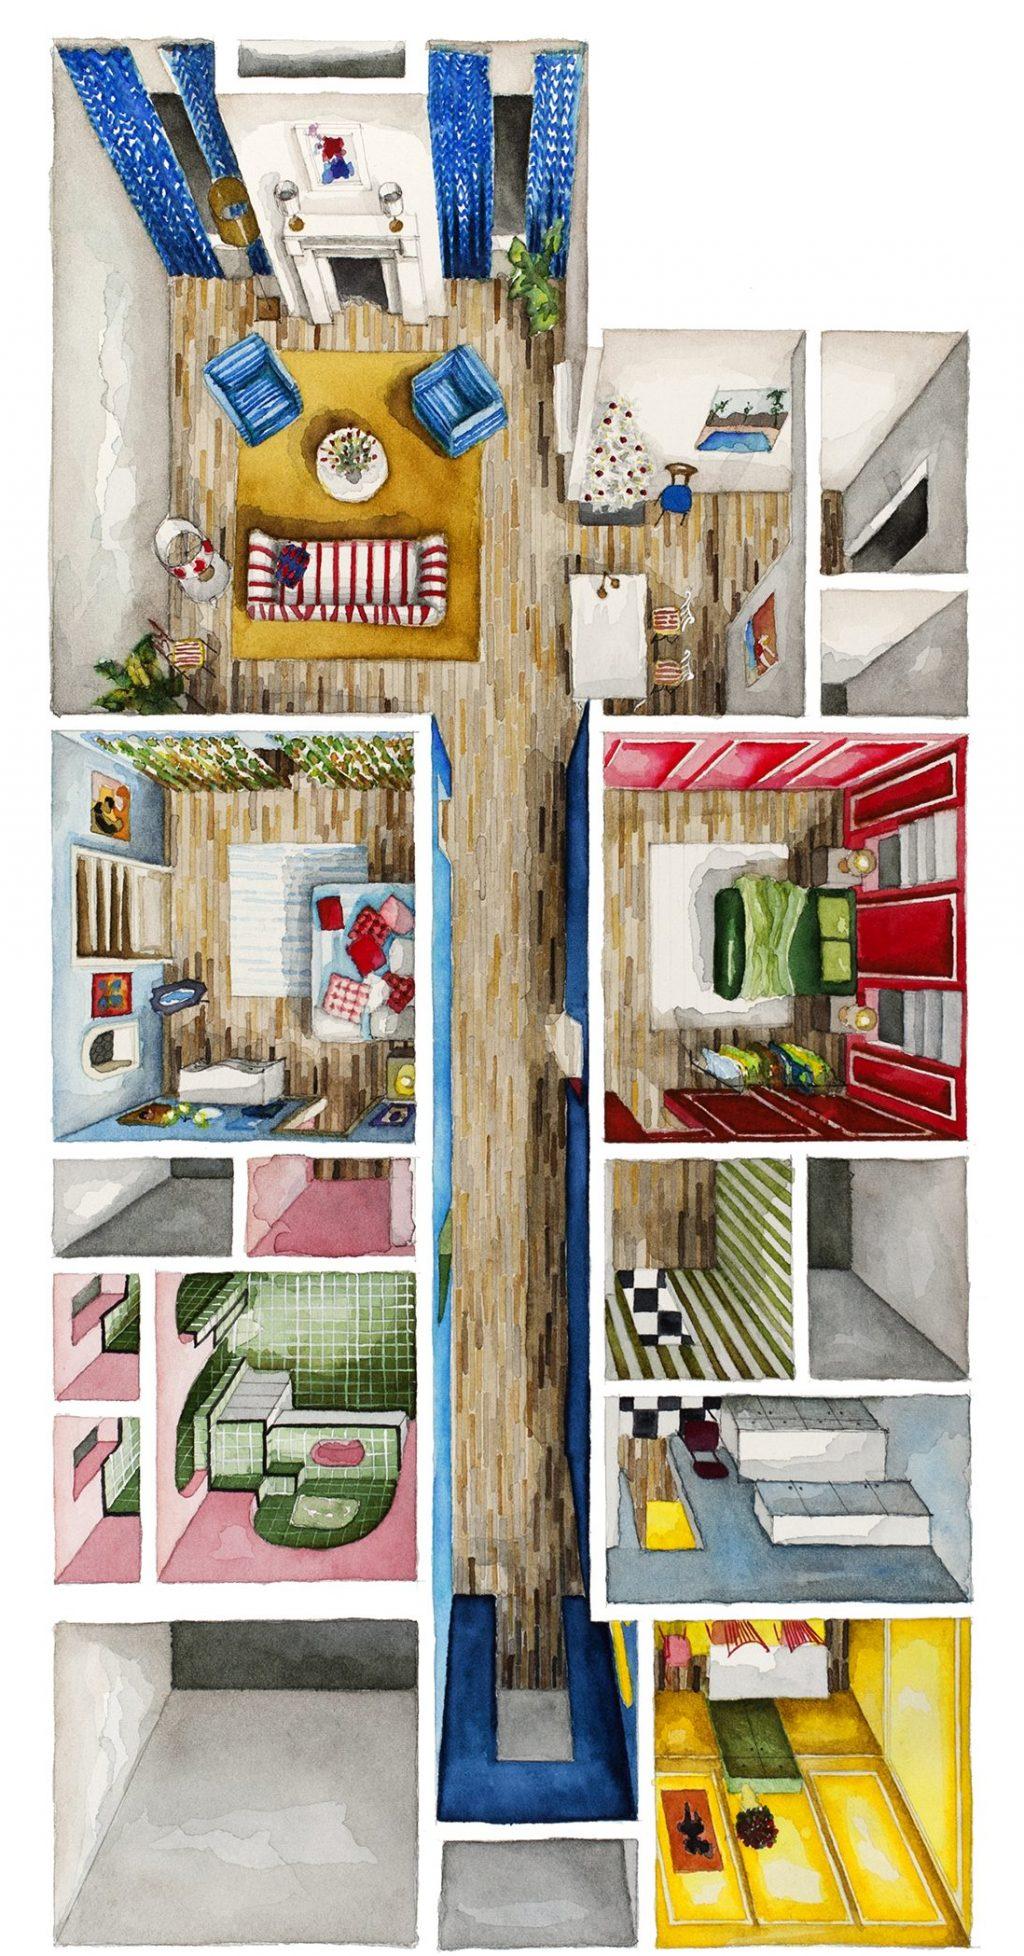 lalaland-film-set-floor-plan-croissant